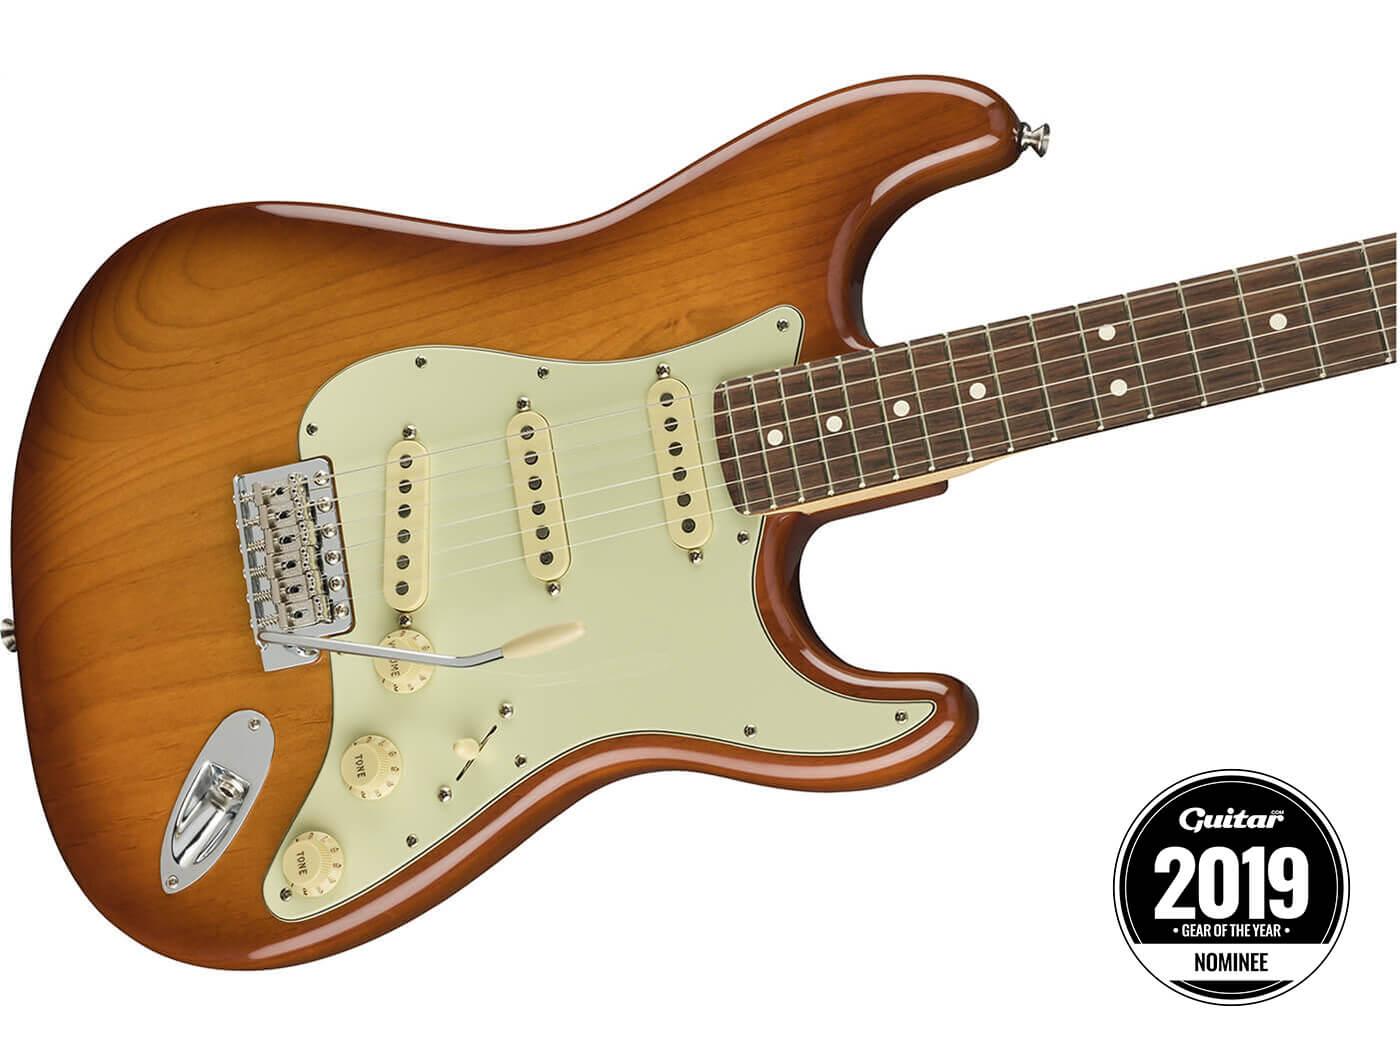 GOTY Fender American Performer Stratocaster